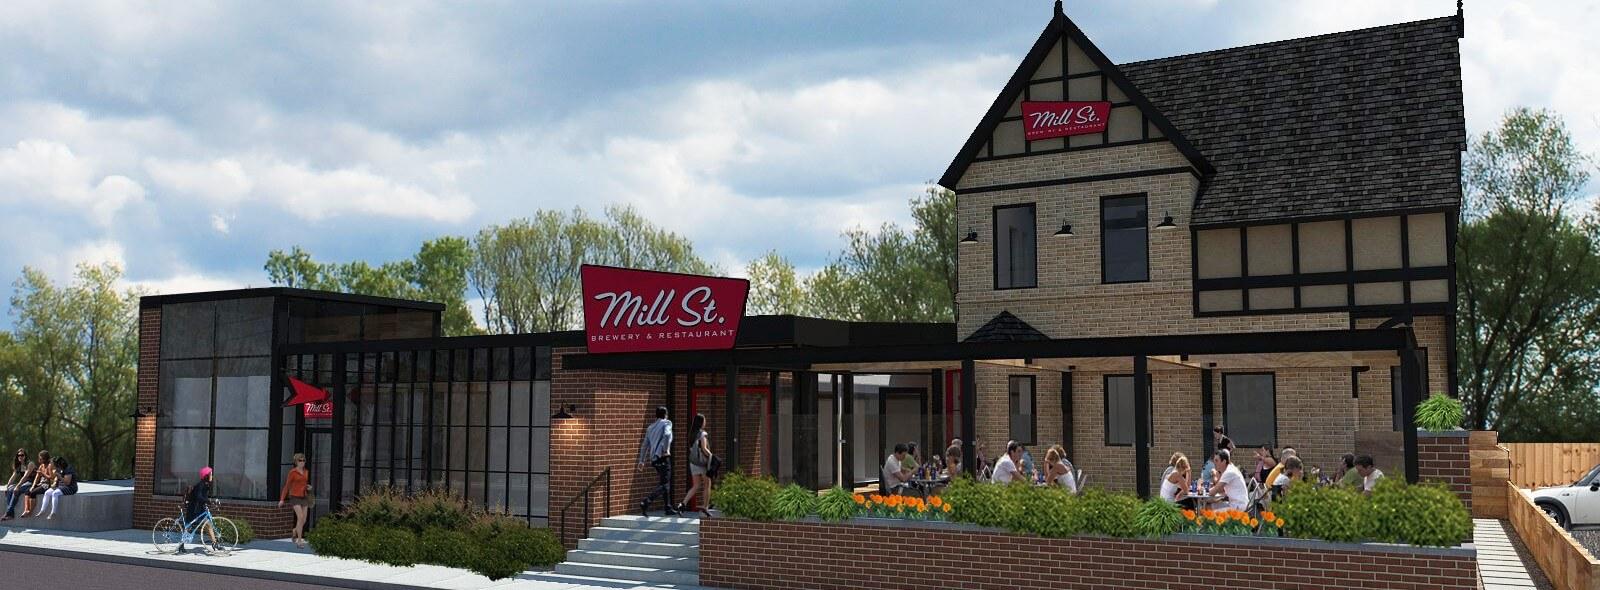 Calgary's new Millstreet Brewery